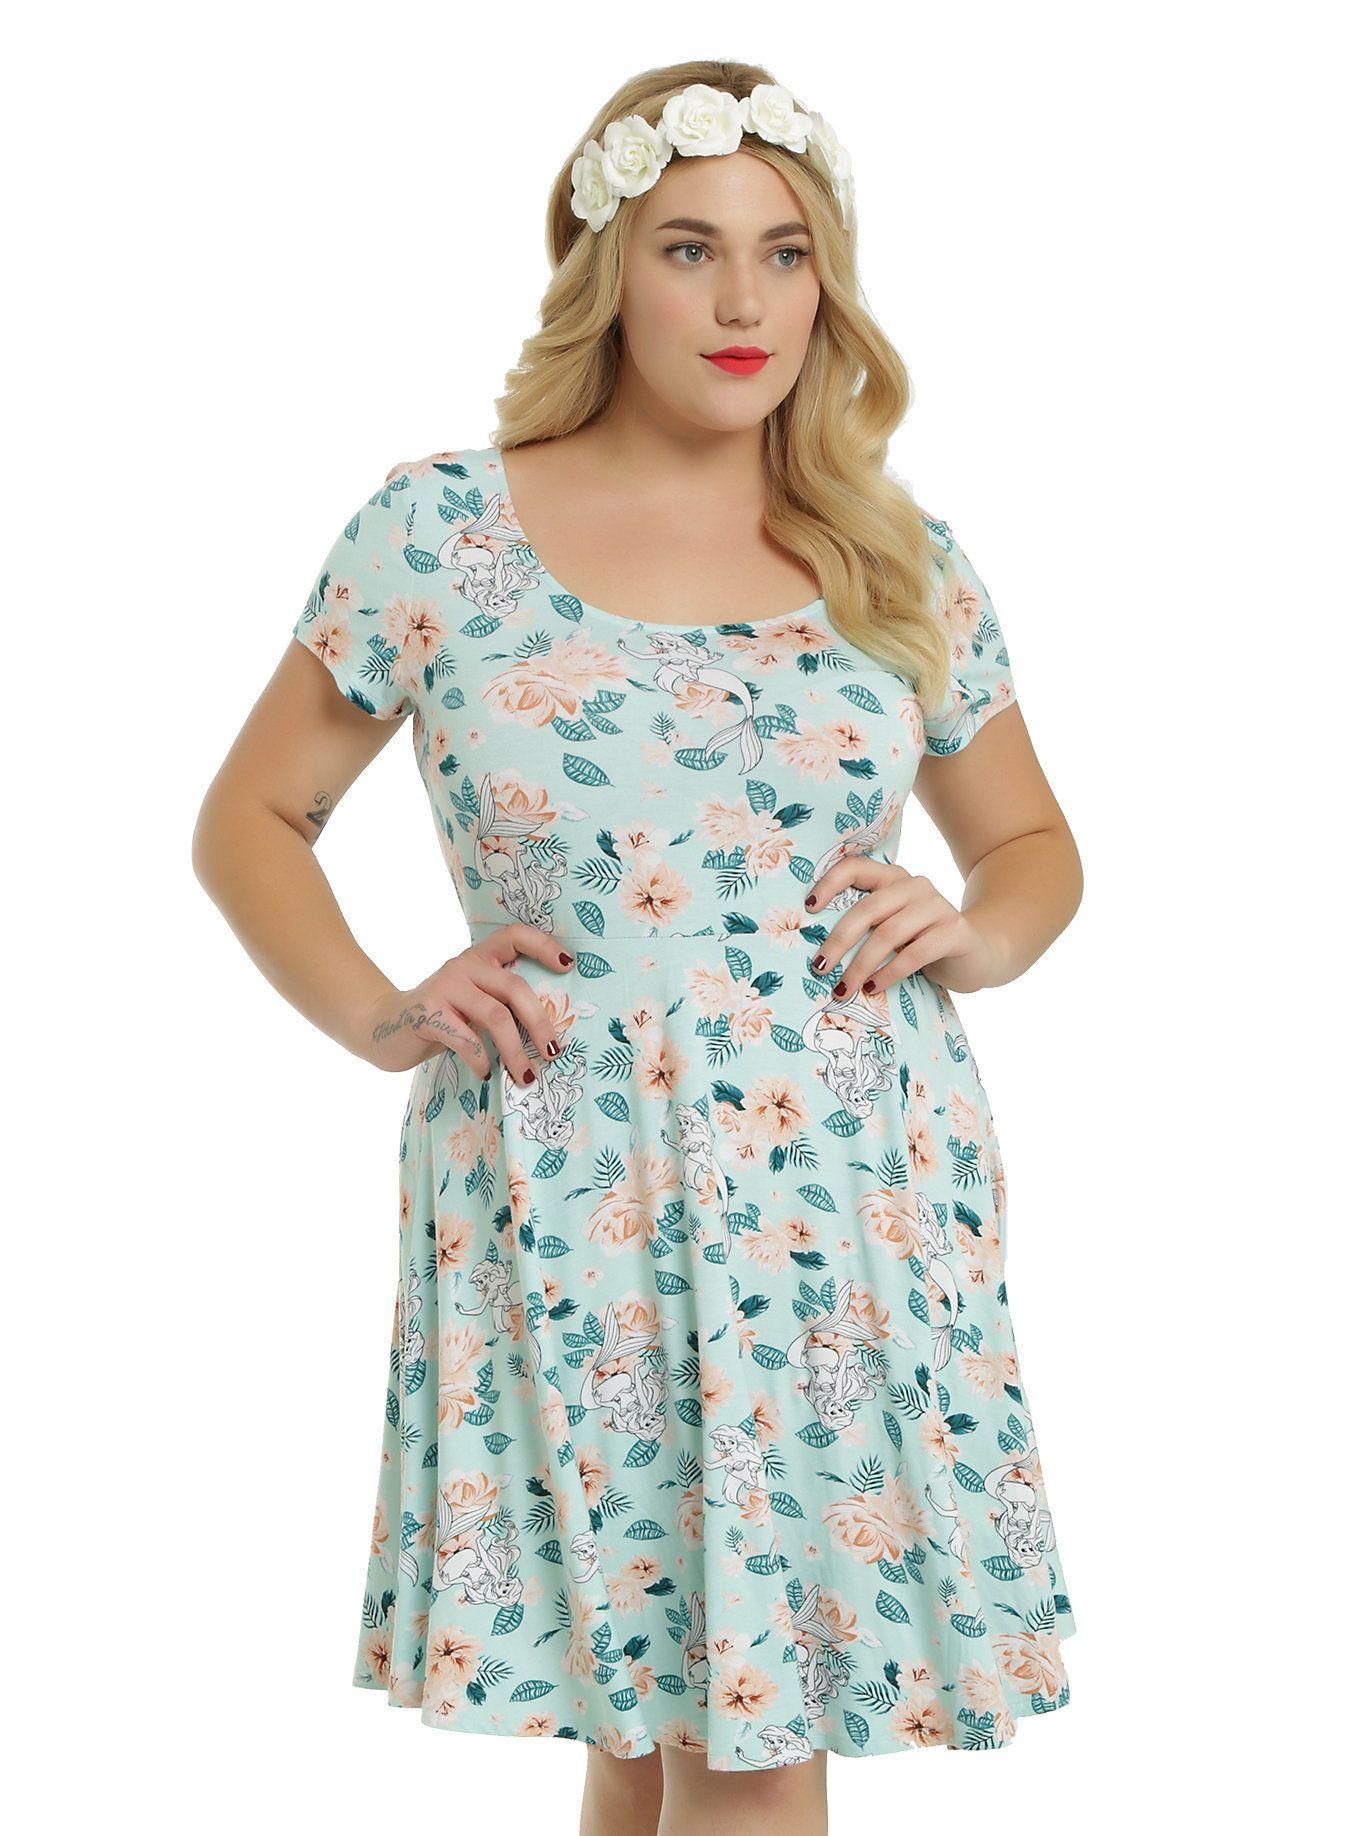 9ff0578bb2a Disney The Little Mermaid Ariel Floral Dress Plus Size